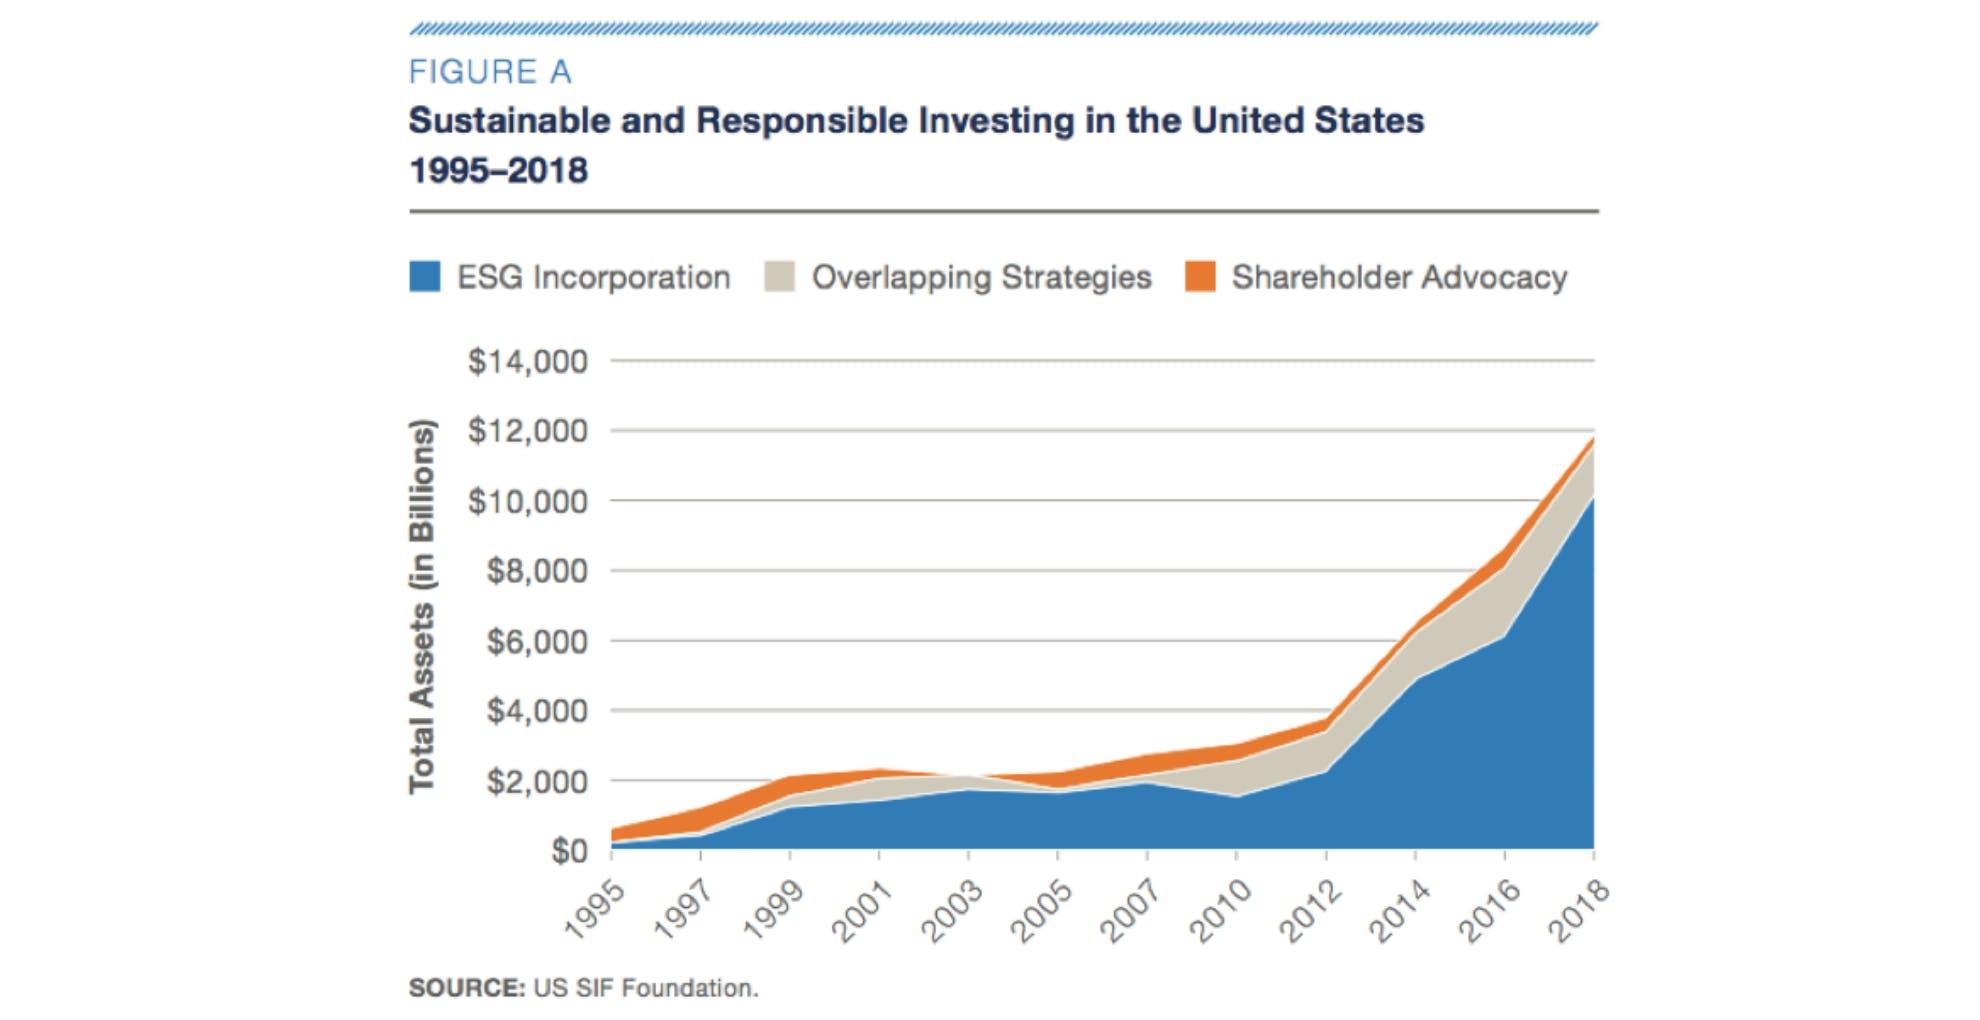 ESG investment growth